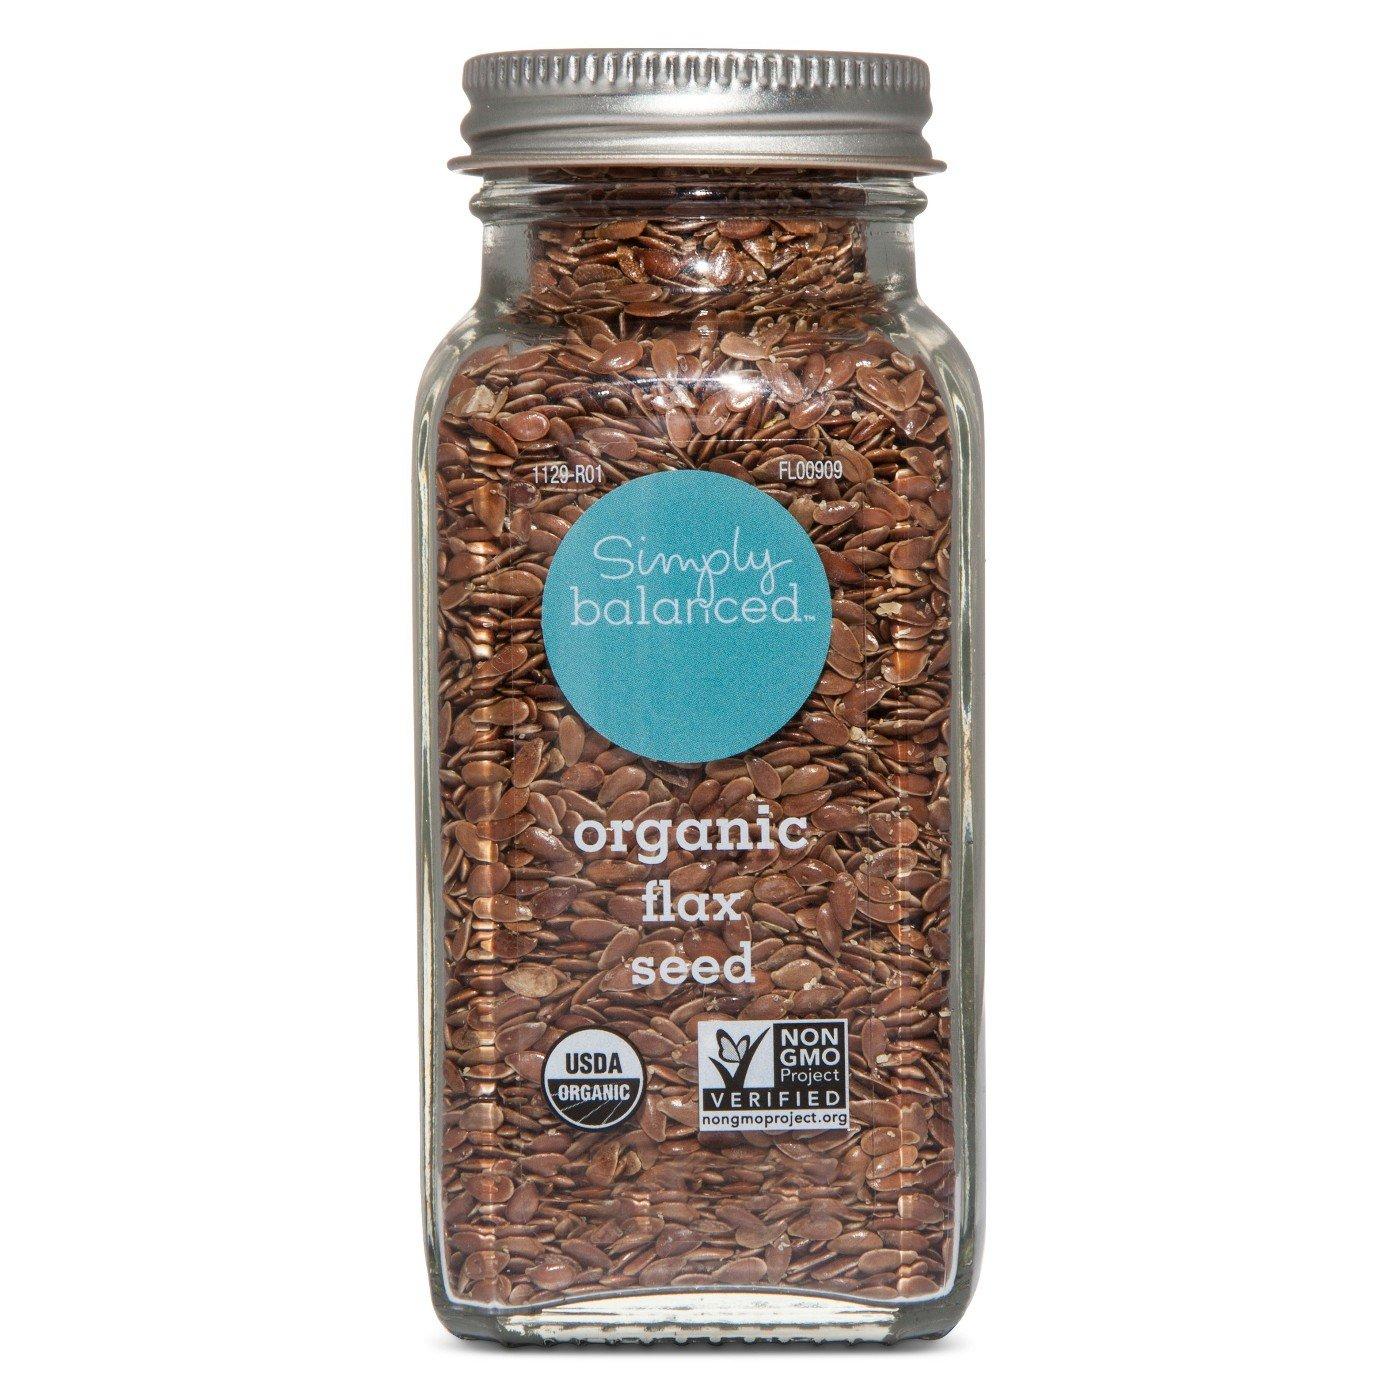 Organic Flax Seed - 3.8oz - Simply Balanced